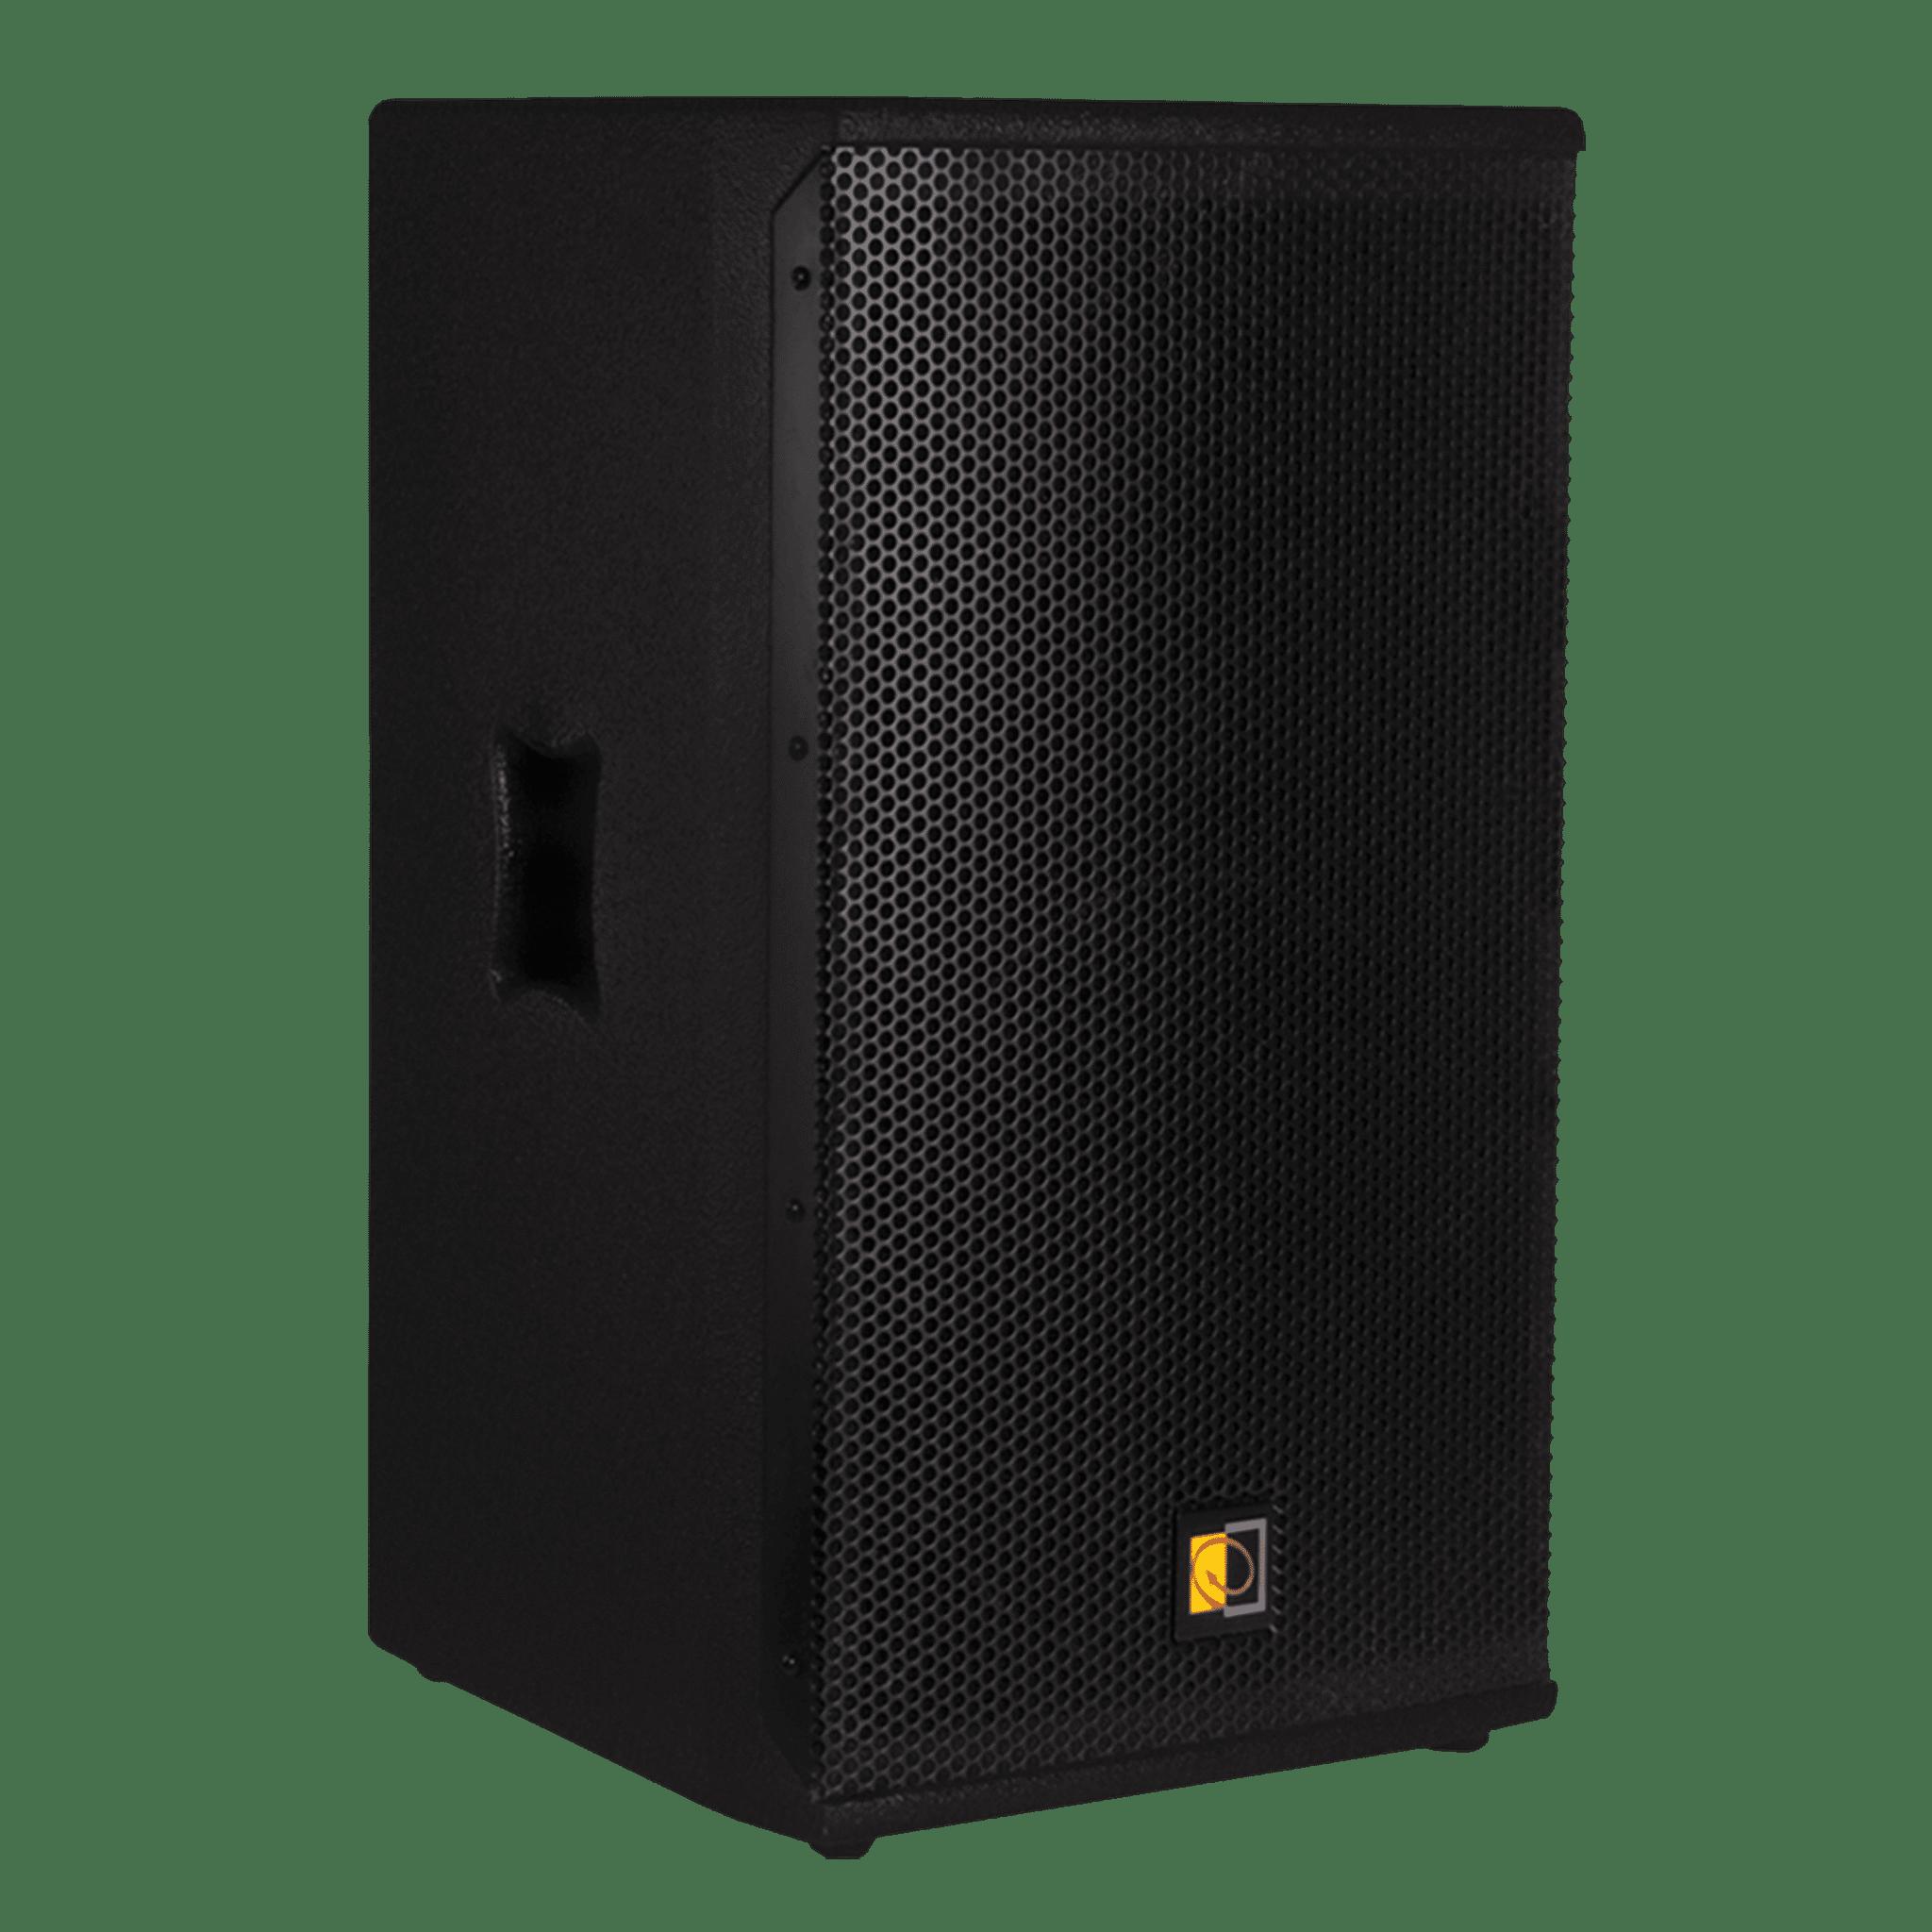 PX112MK2 - Black version